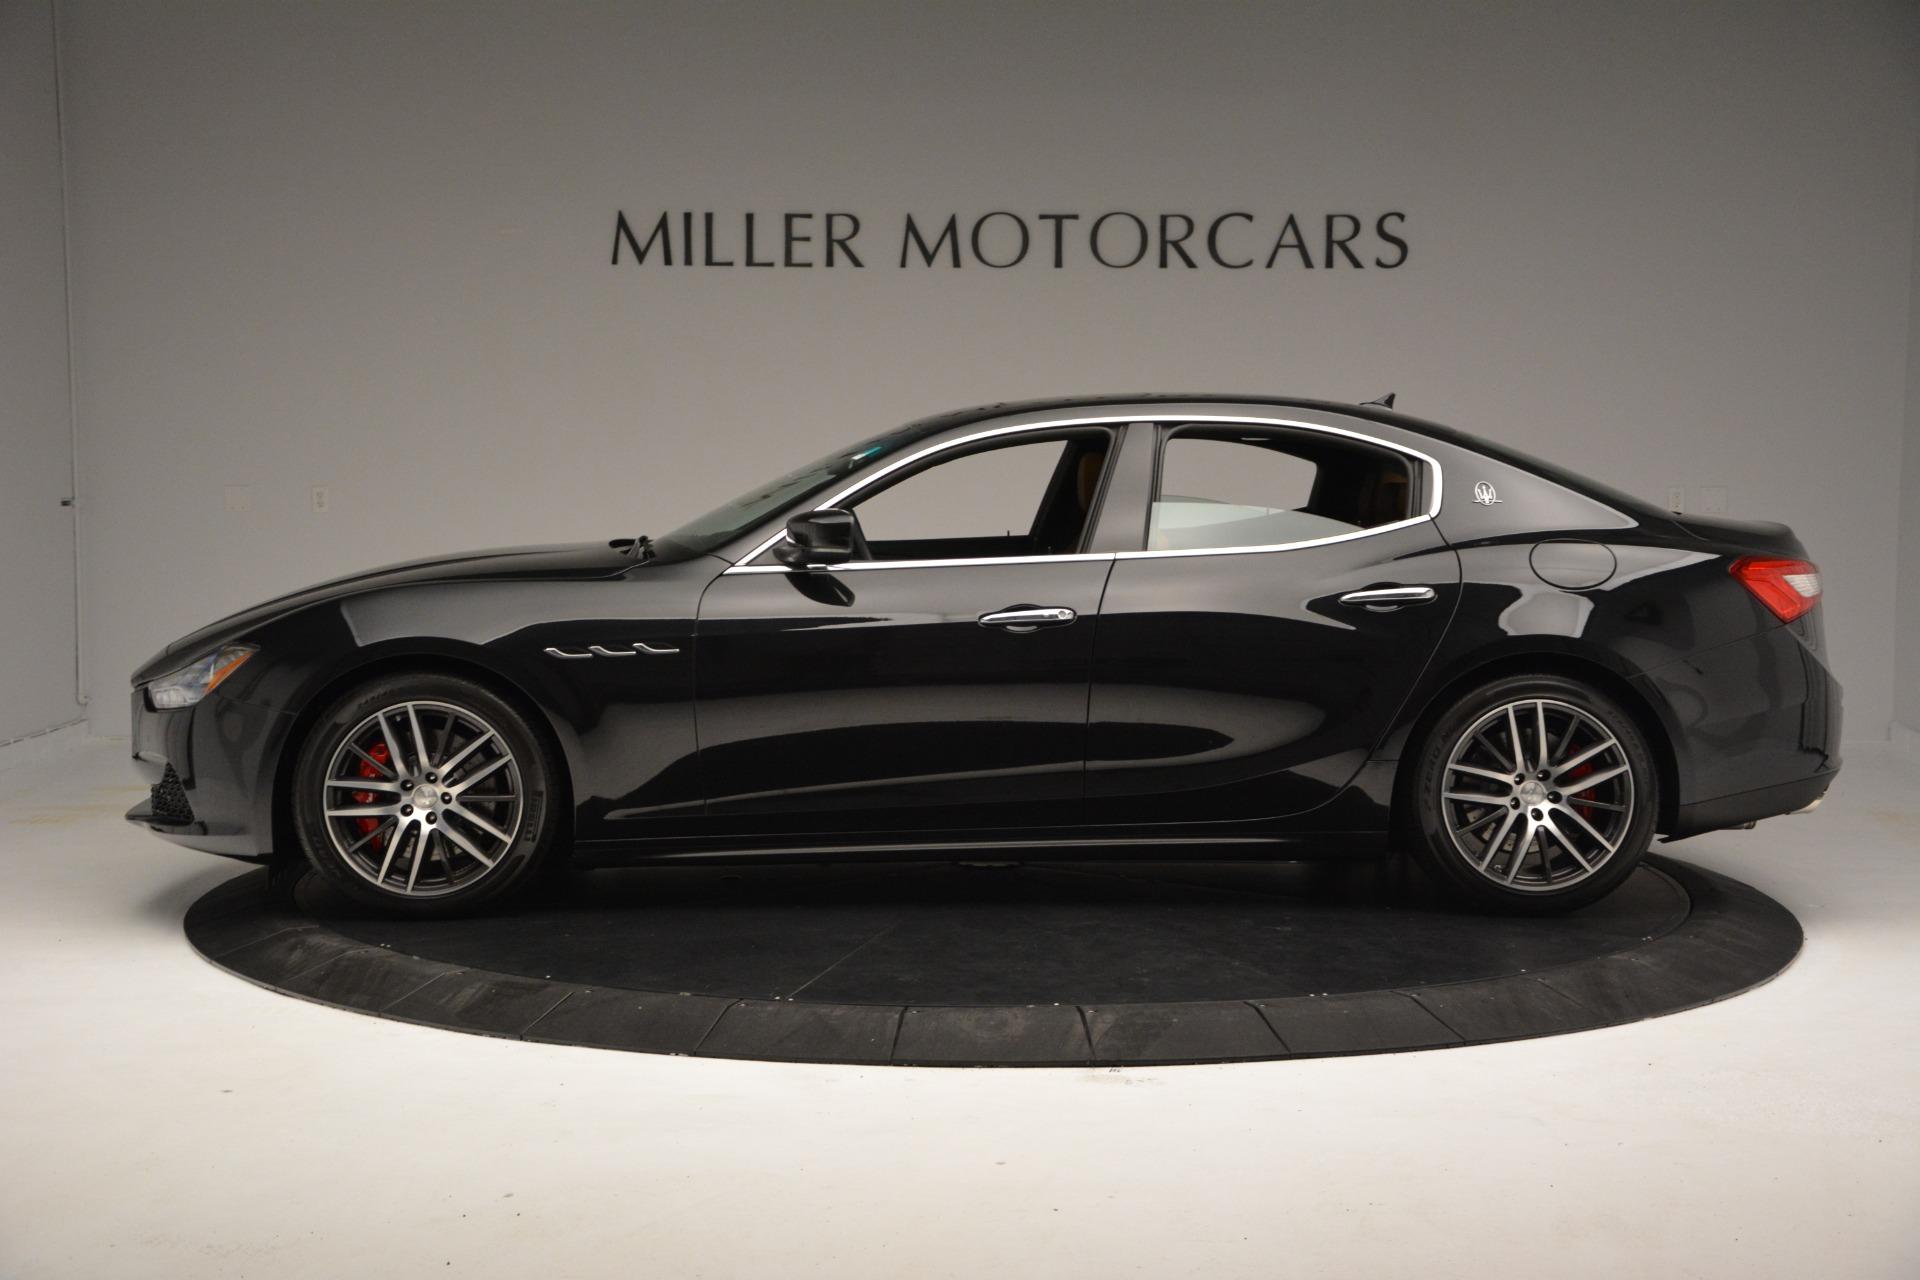 New 2017 Maserati Ghibli SQ4 S Q4 For Sale In Westport, CT 1085_p3